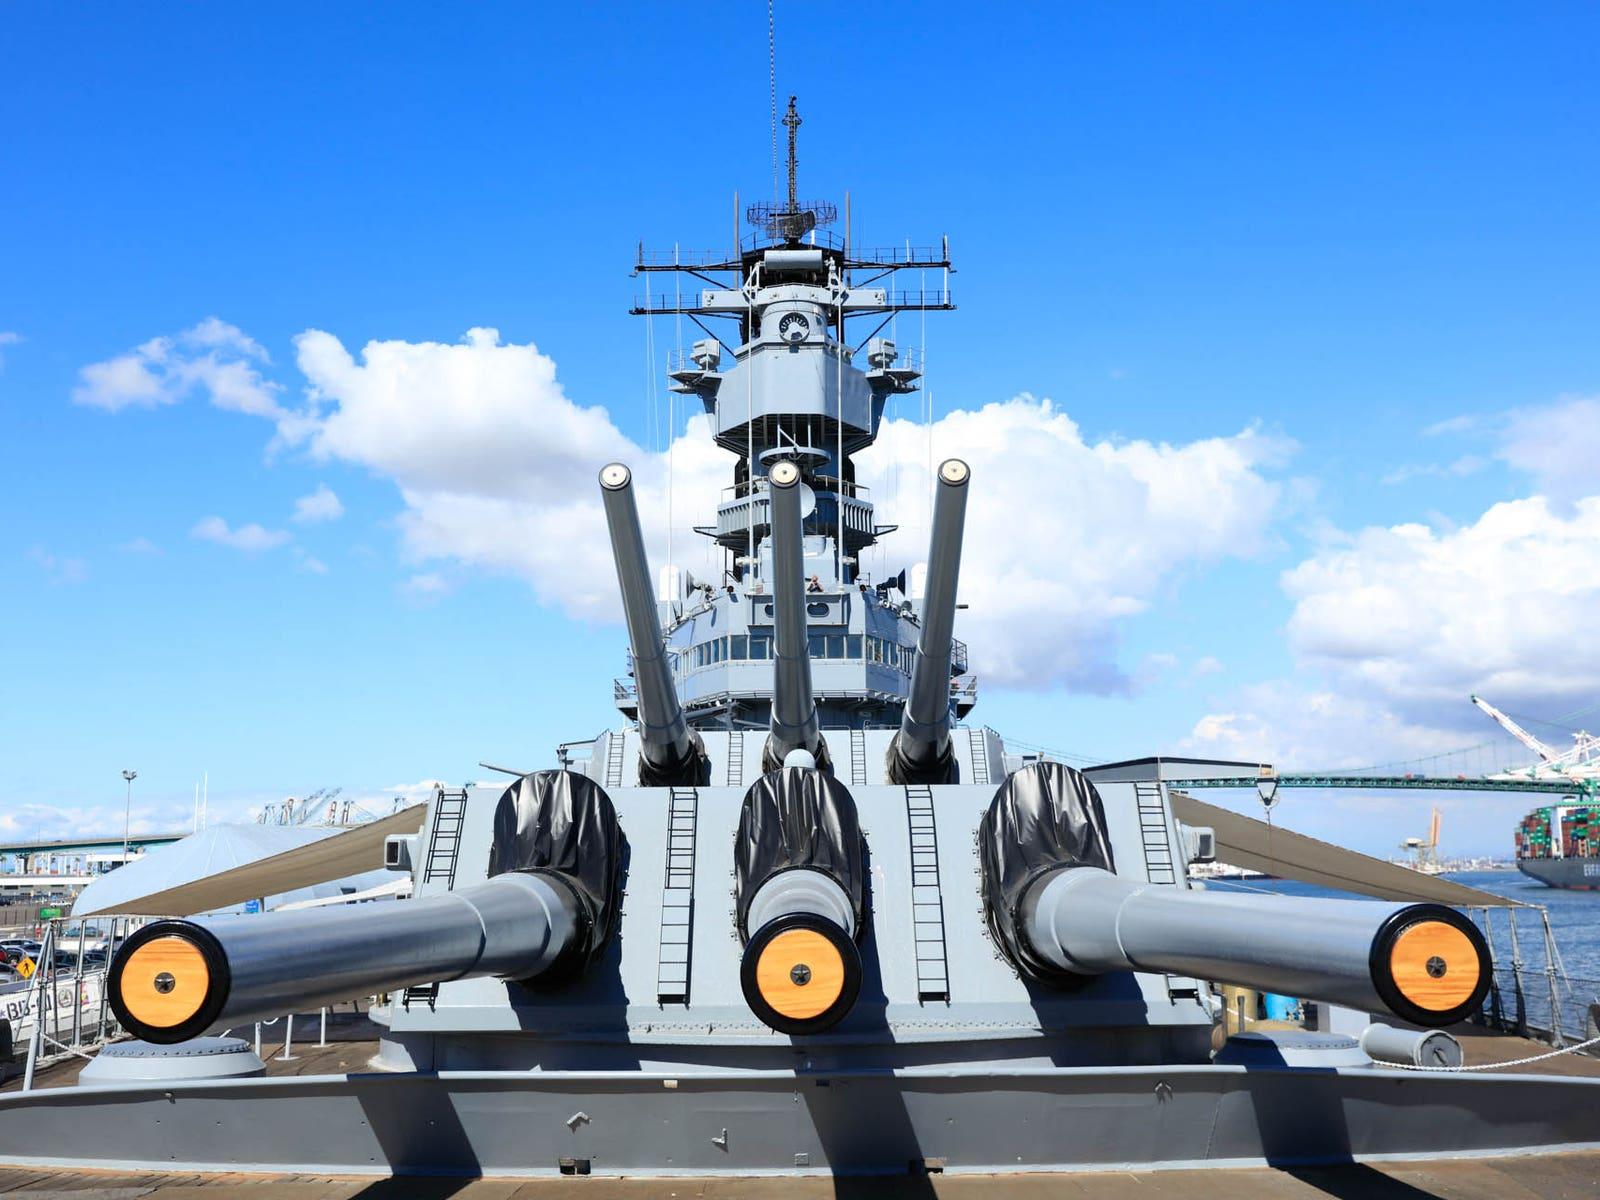 Battleship IOWA at the Port of Los Angeles in San Pedro